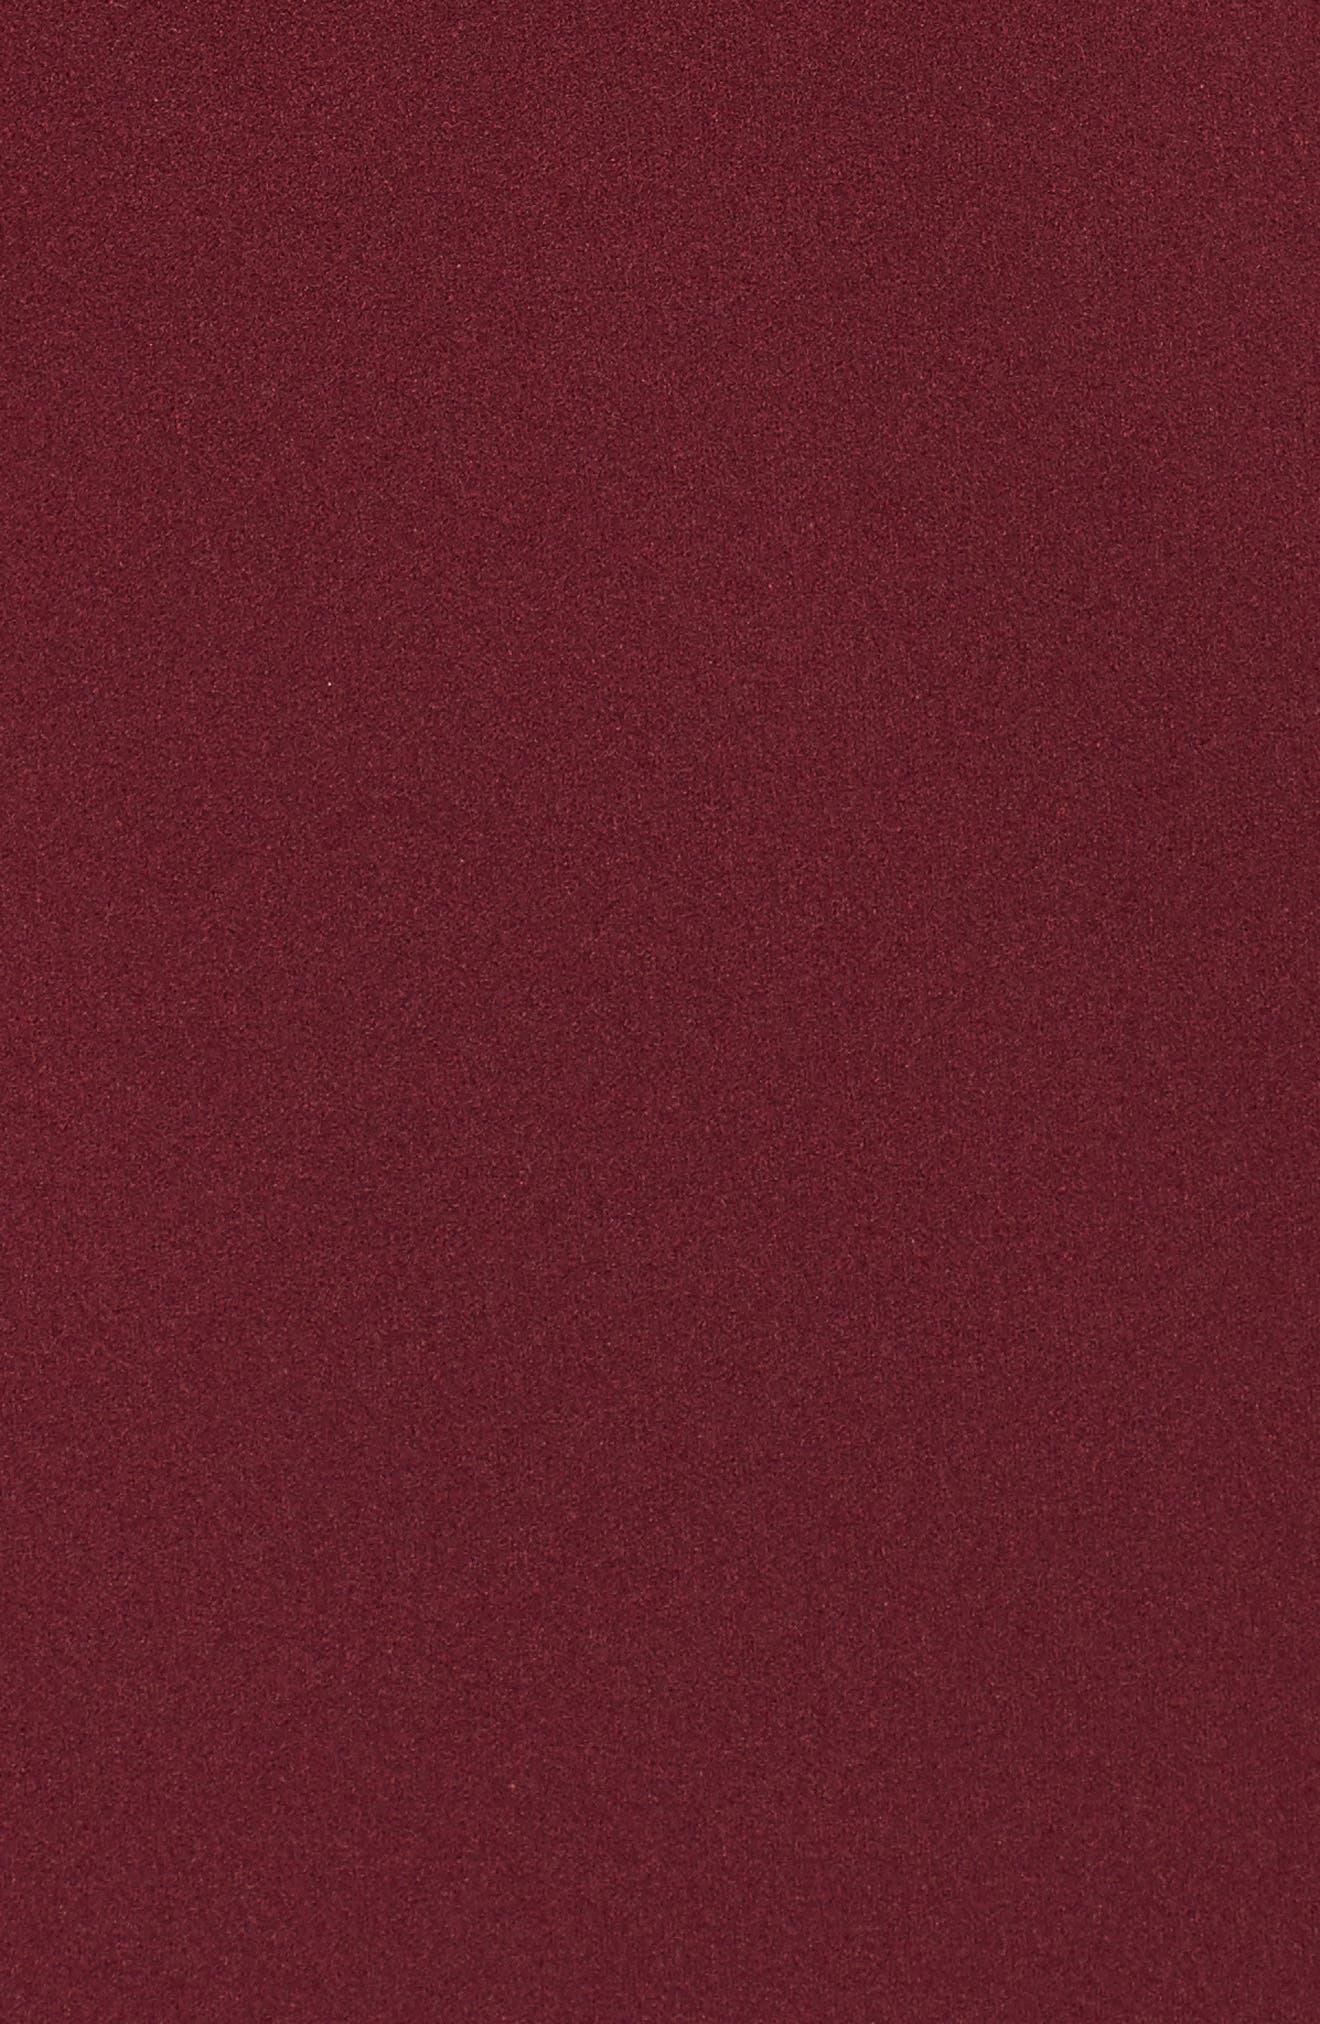 Asymmetrical Neck Sheath Dress,                             Alternate thumbnail 5, color,                             Burgundy